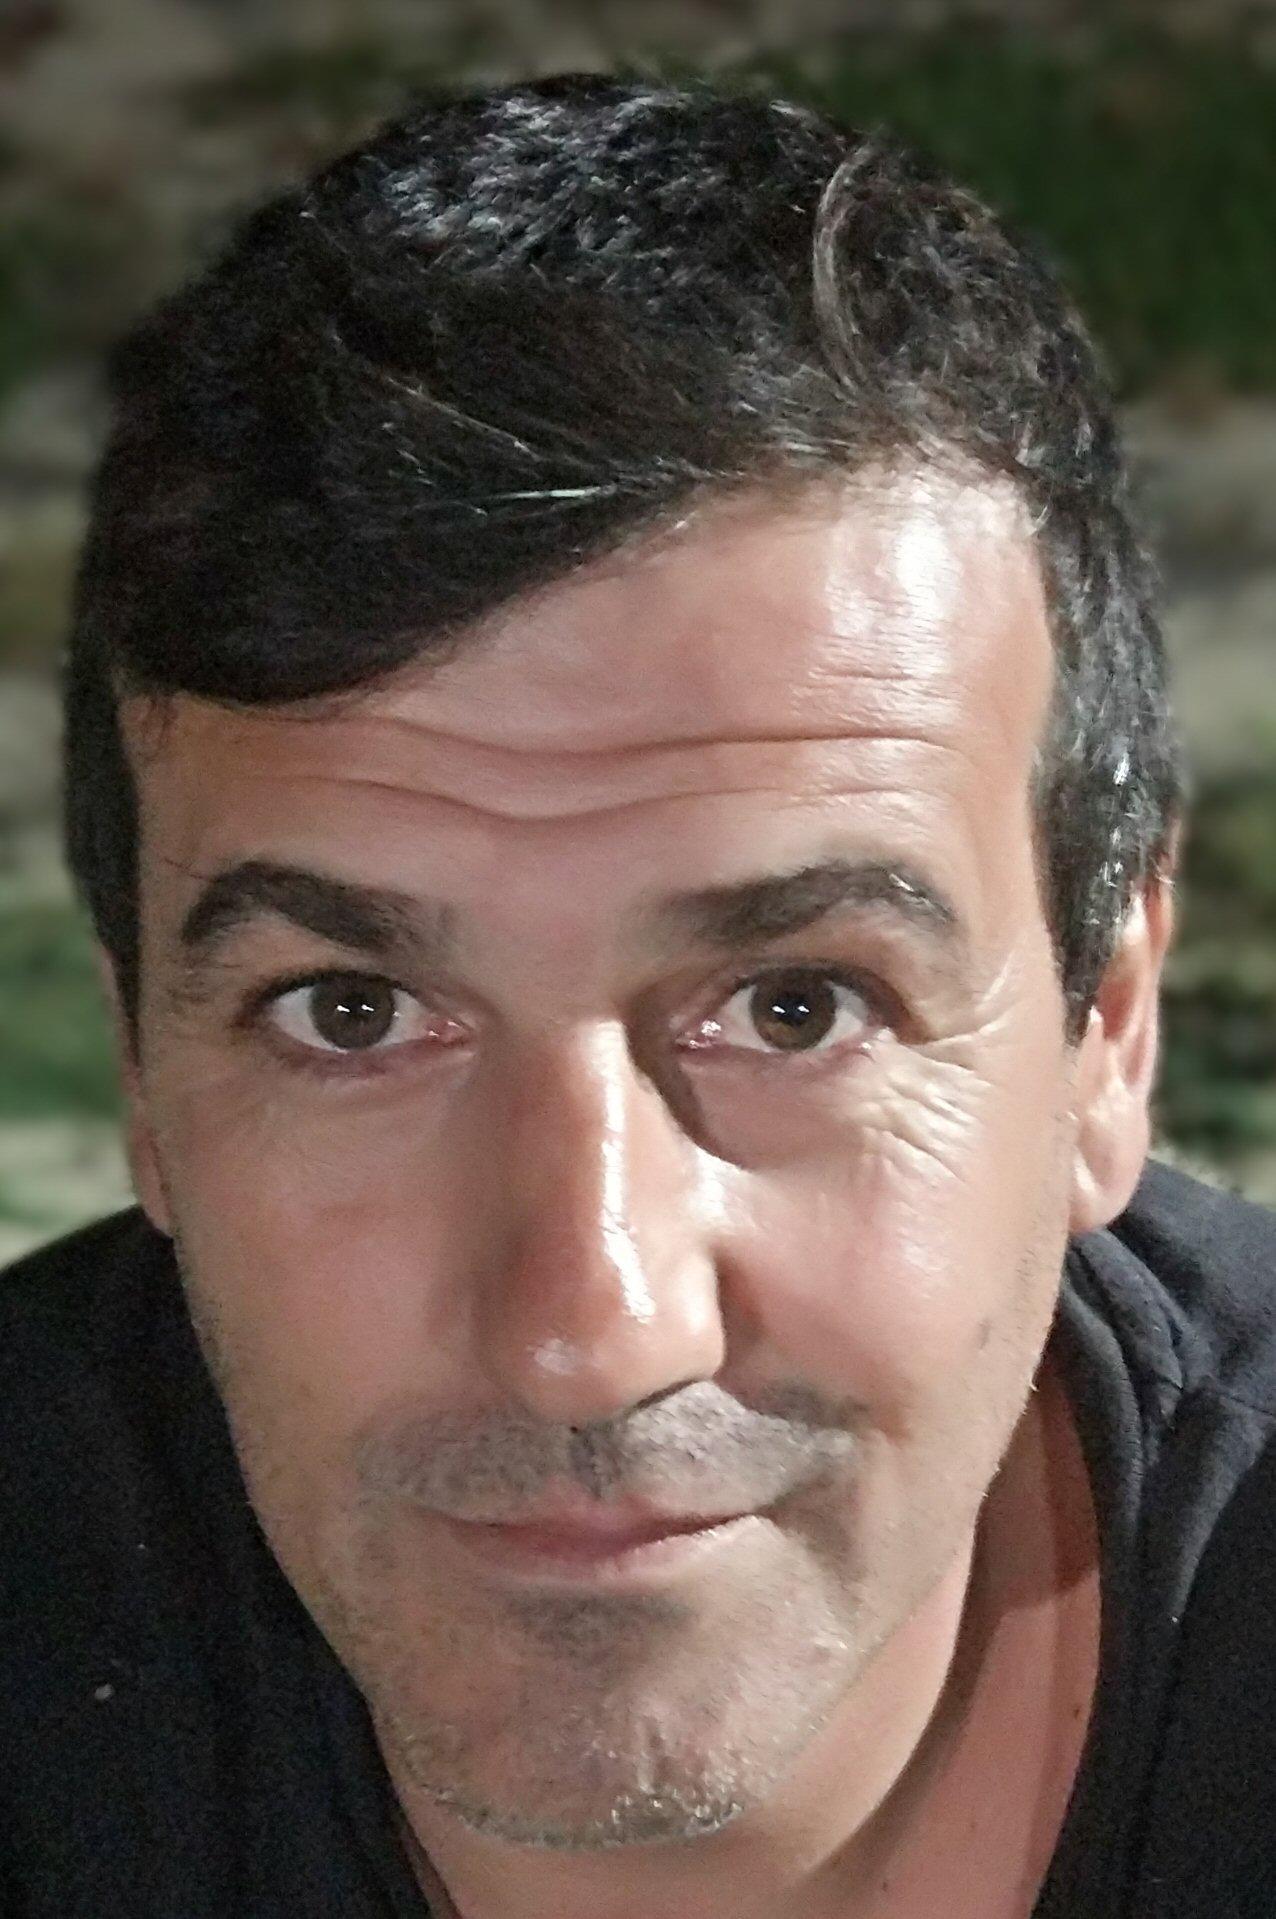 LUÍS MIGUEL OLIVEIRA CANCELA